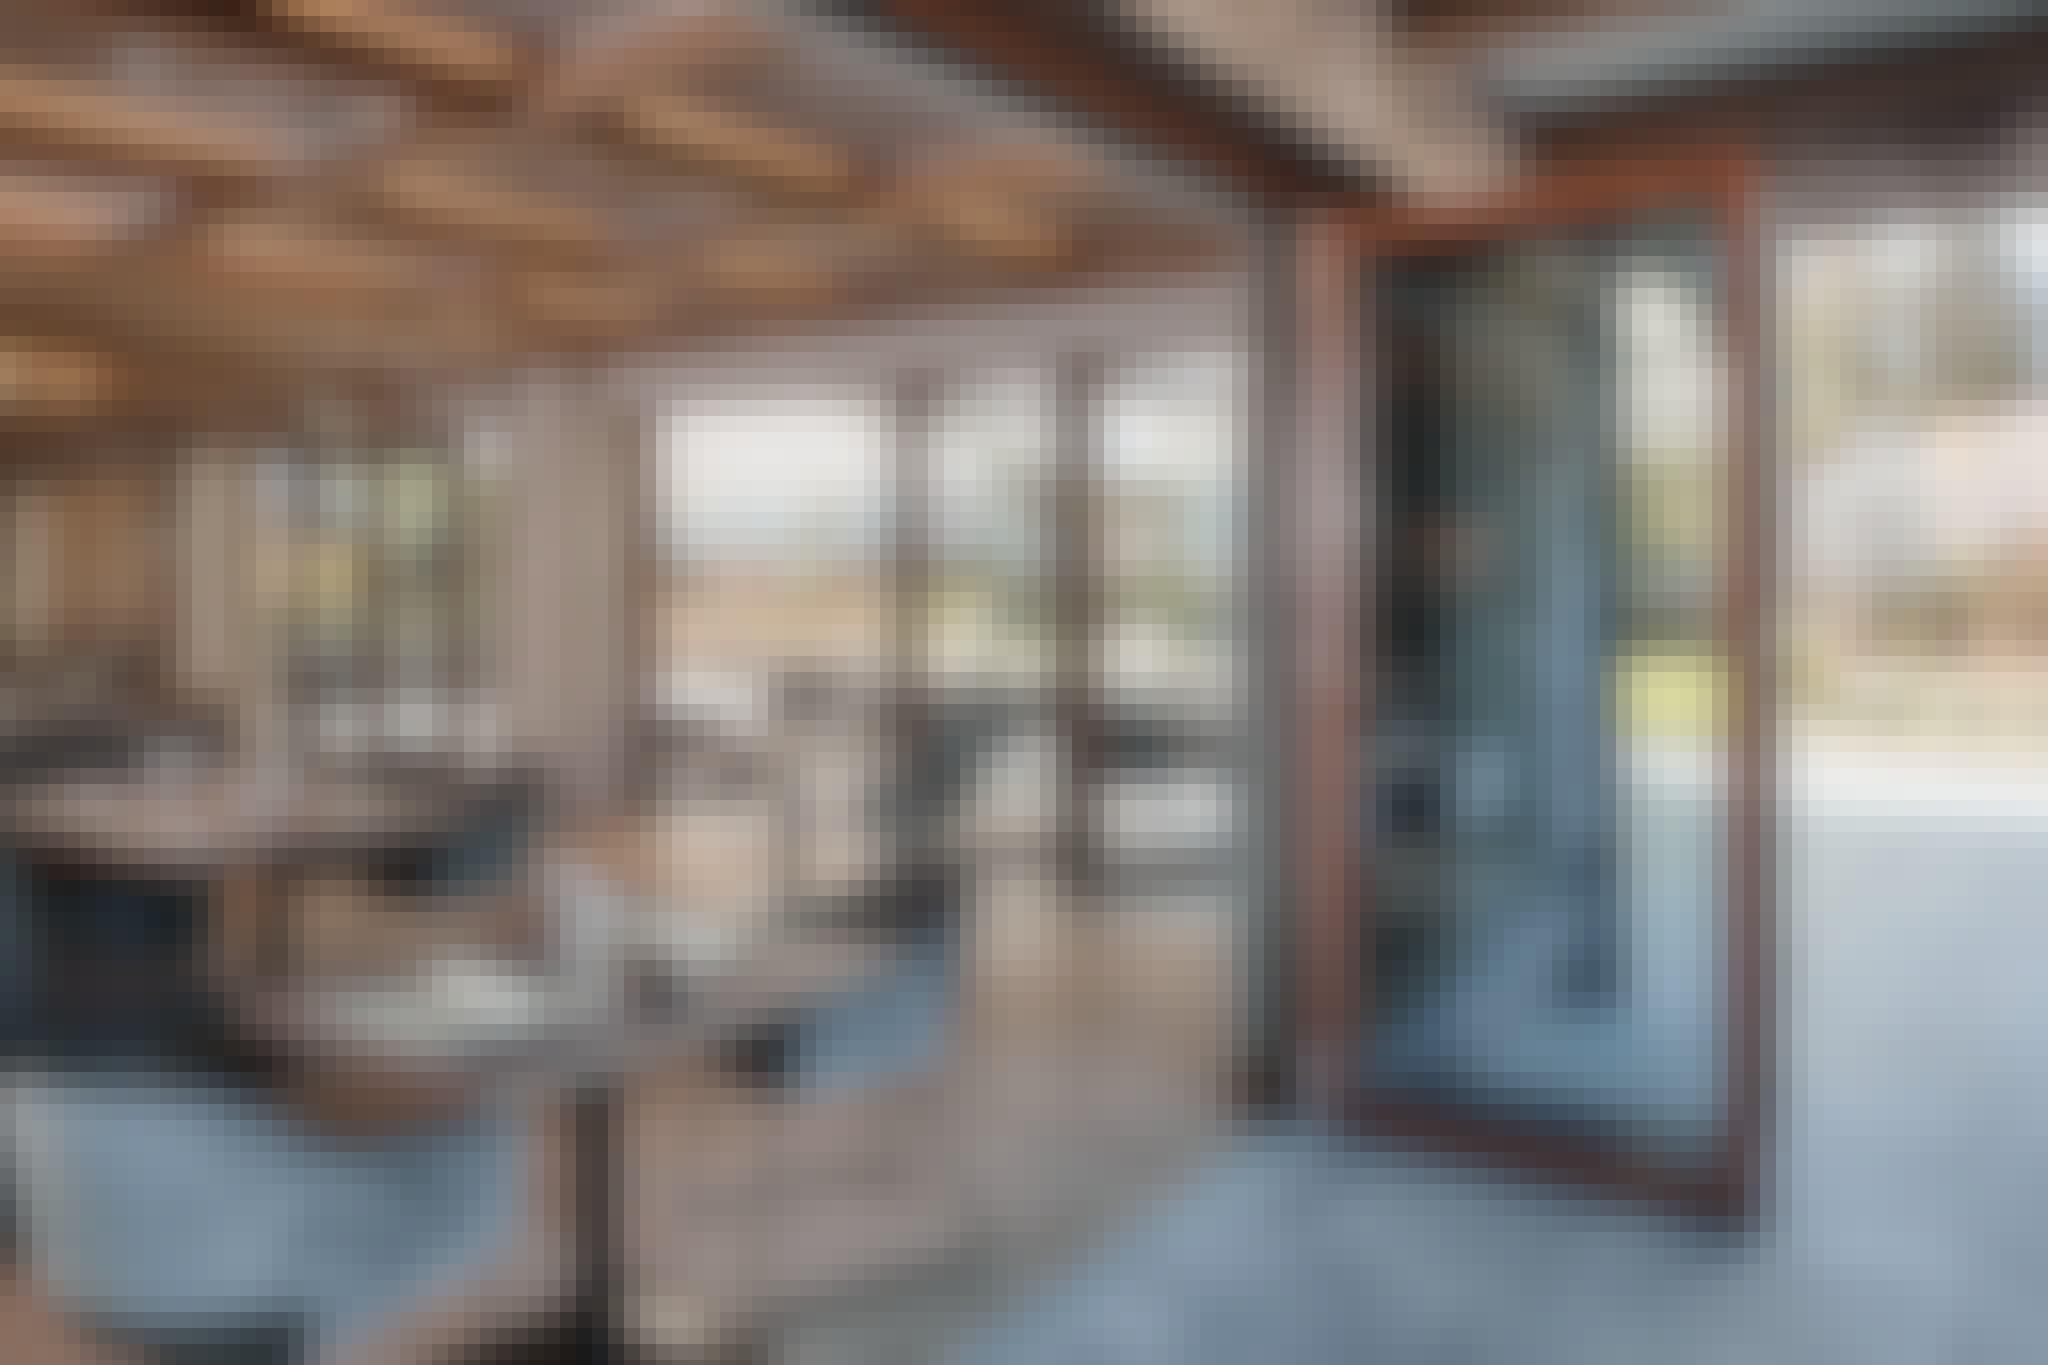 commercial wood framed folding glass walls